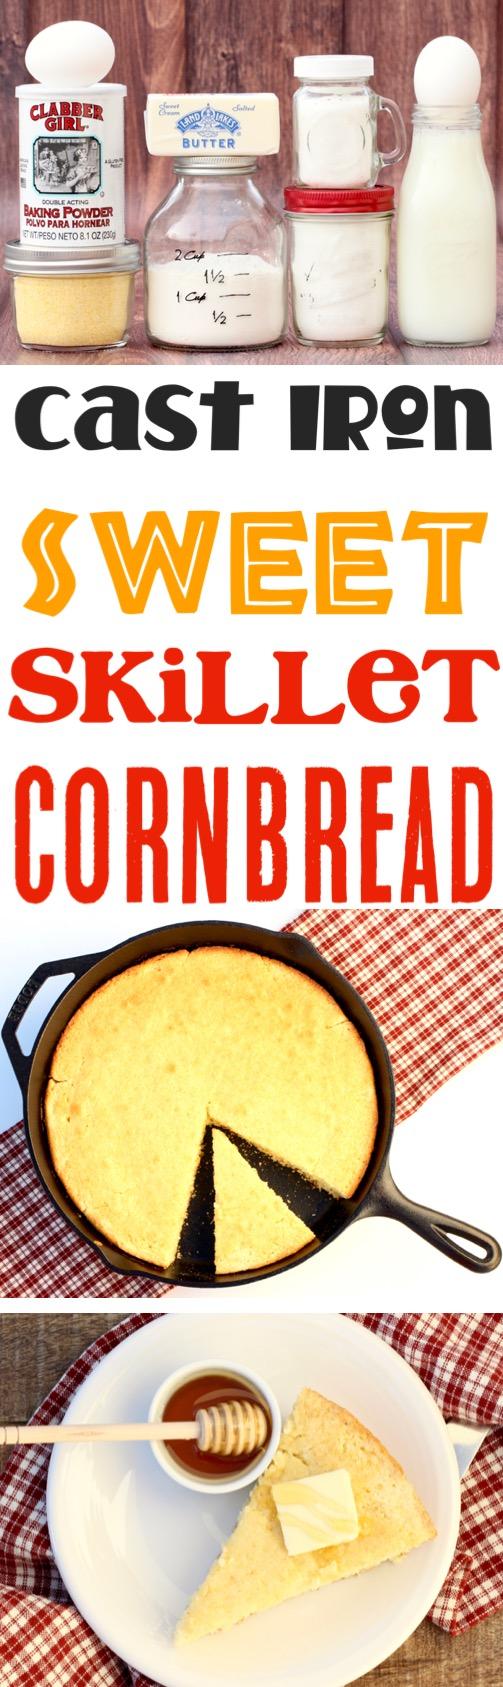 Skillet Cornbread Cast Iron Sweet Recipe